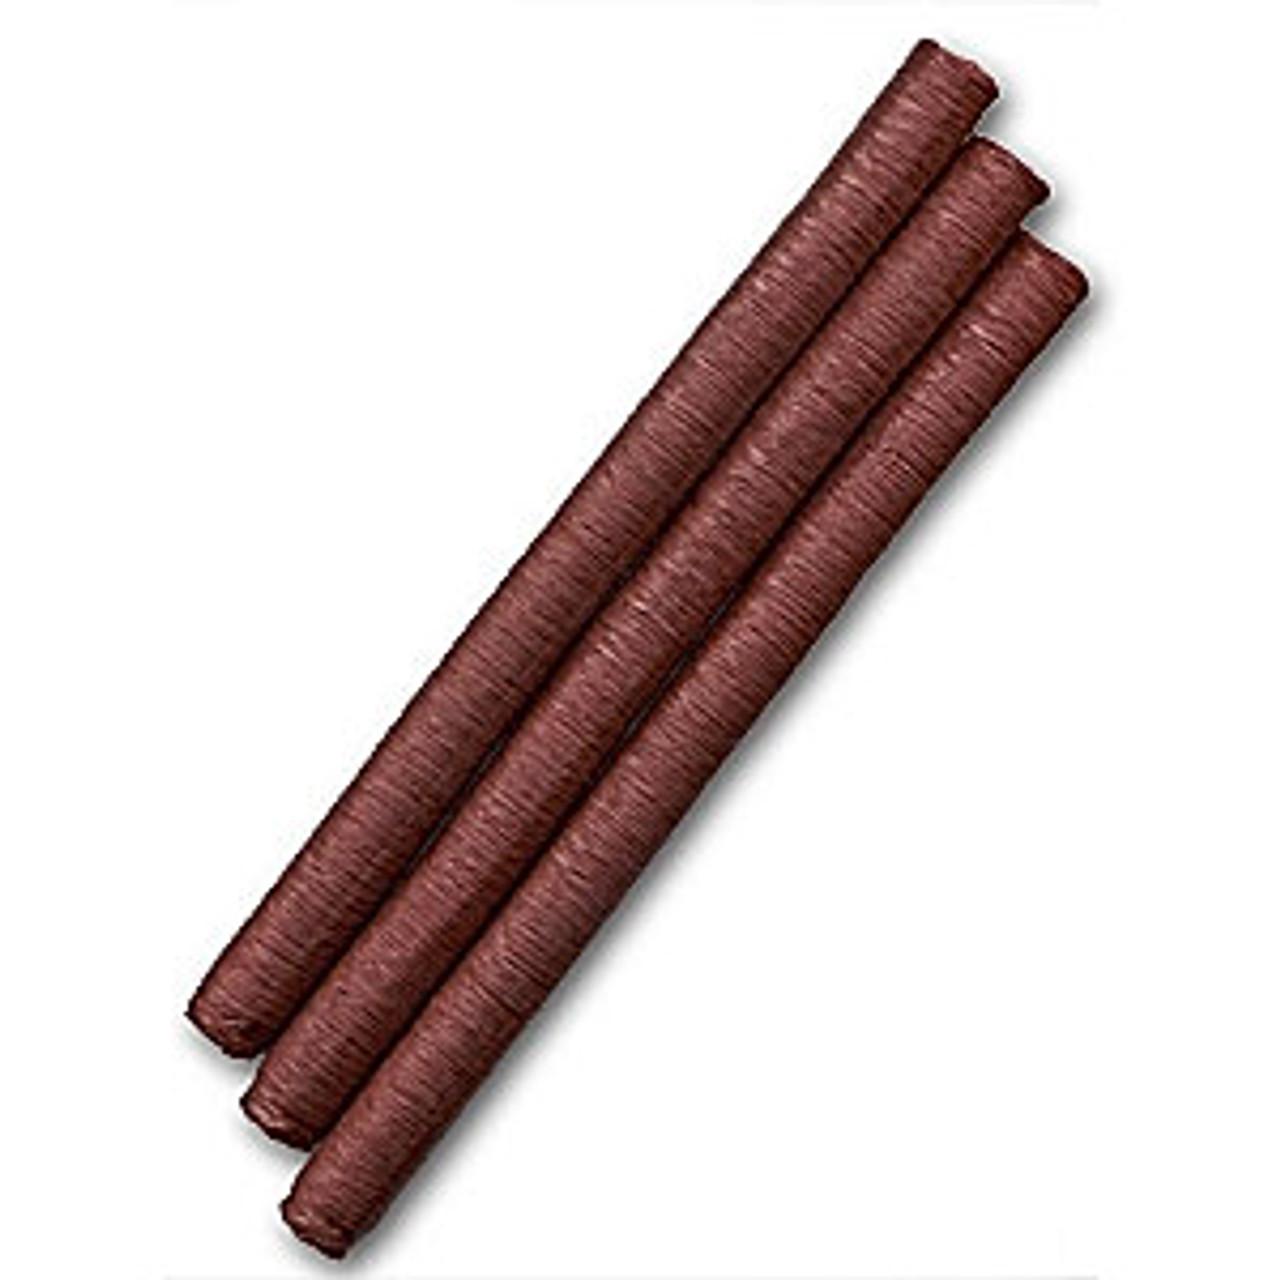 Mahogany Snack Stick Collagen Casing USM-20 Caliber (21mm Stuffed) x 15 Meters